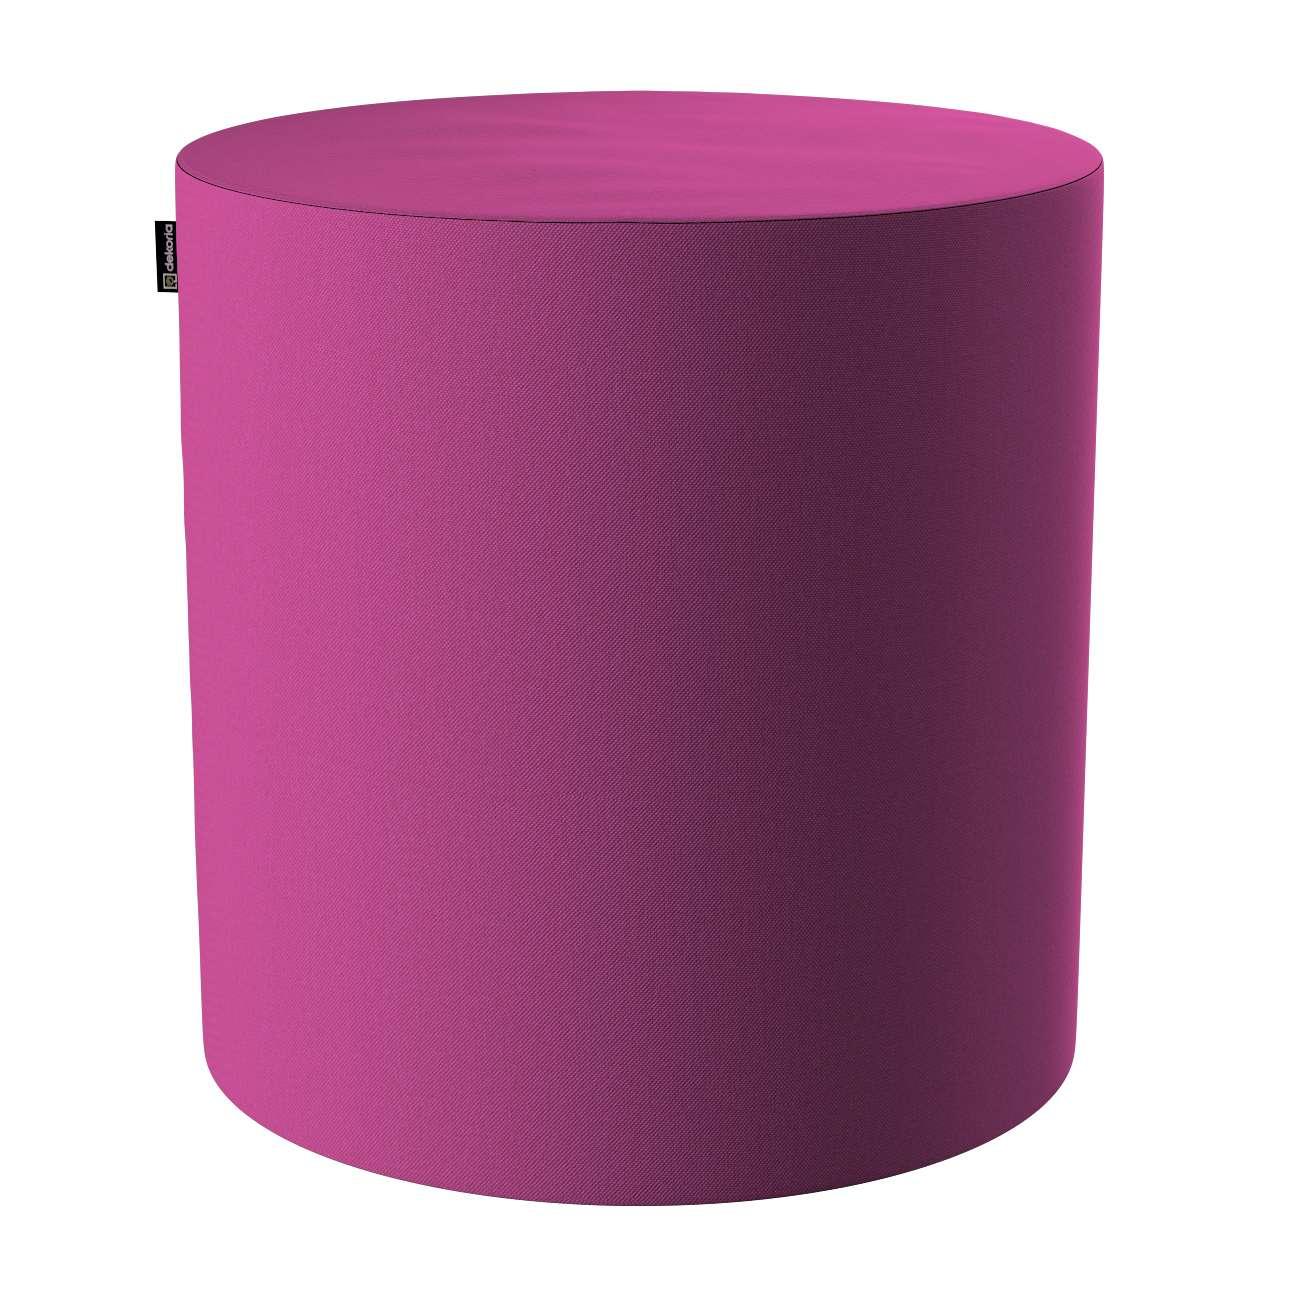 Pouf Barrel von der Kollektion Etna, Stoff: 705-23